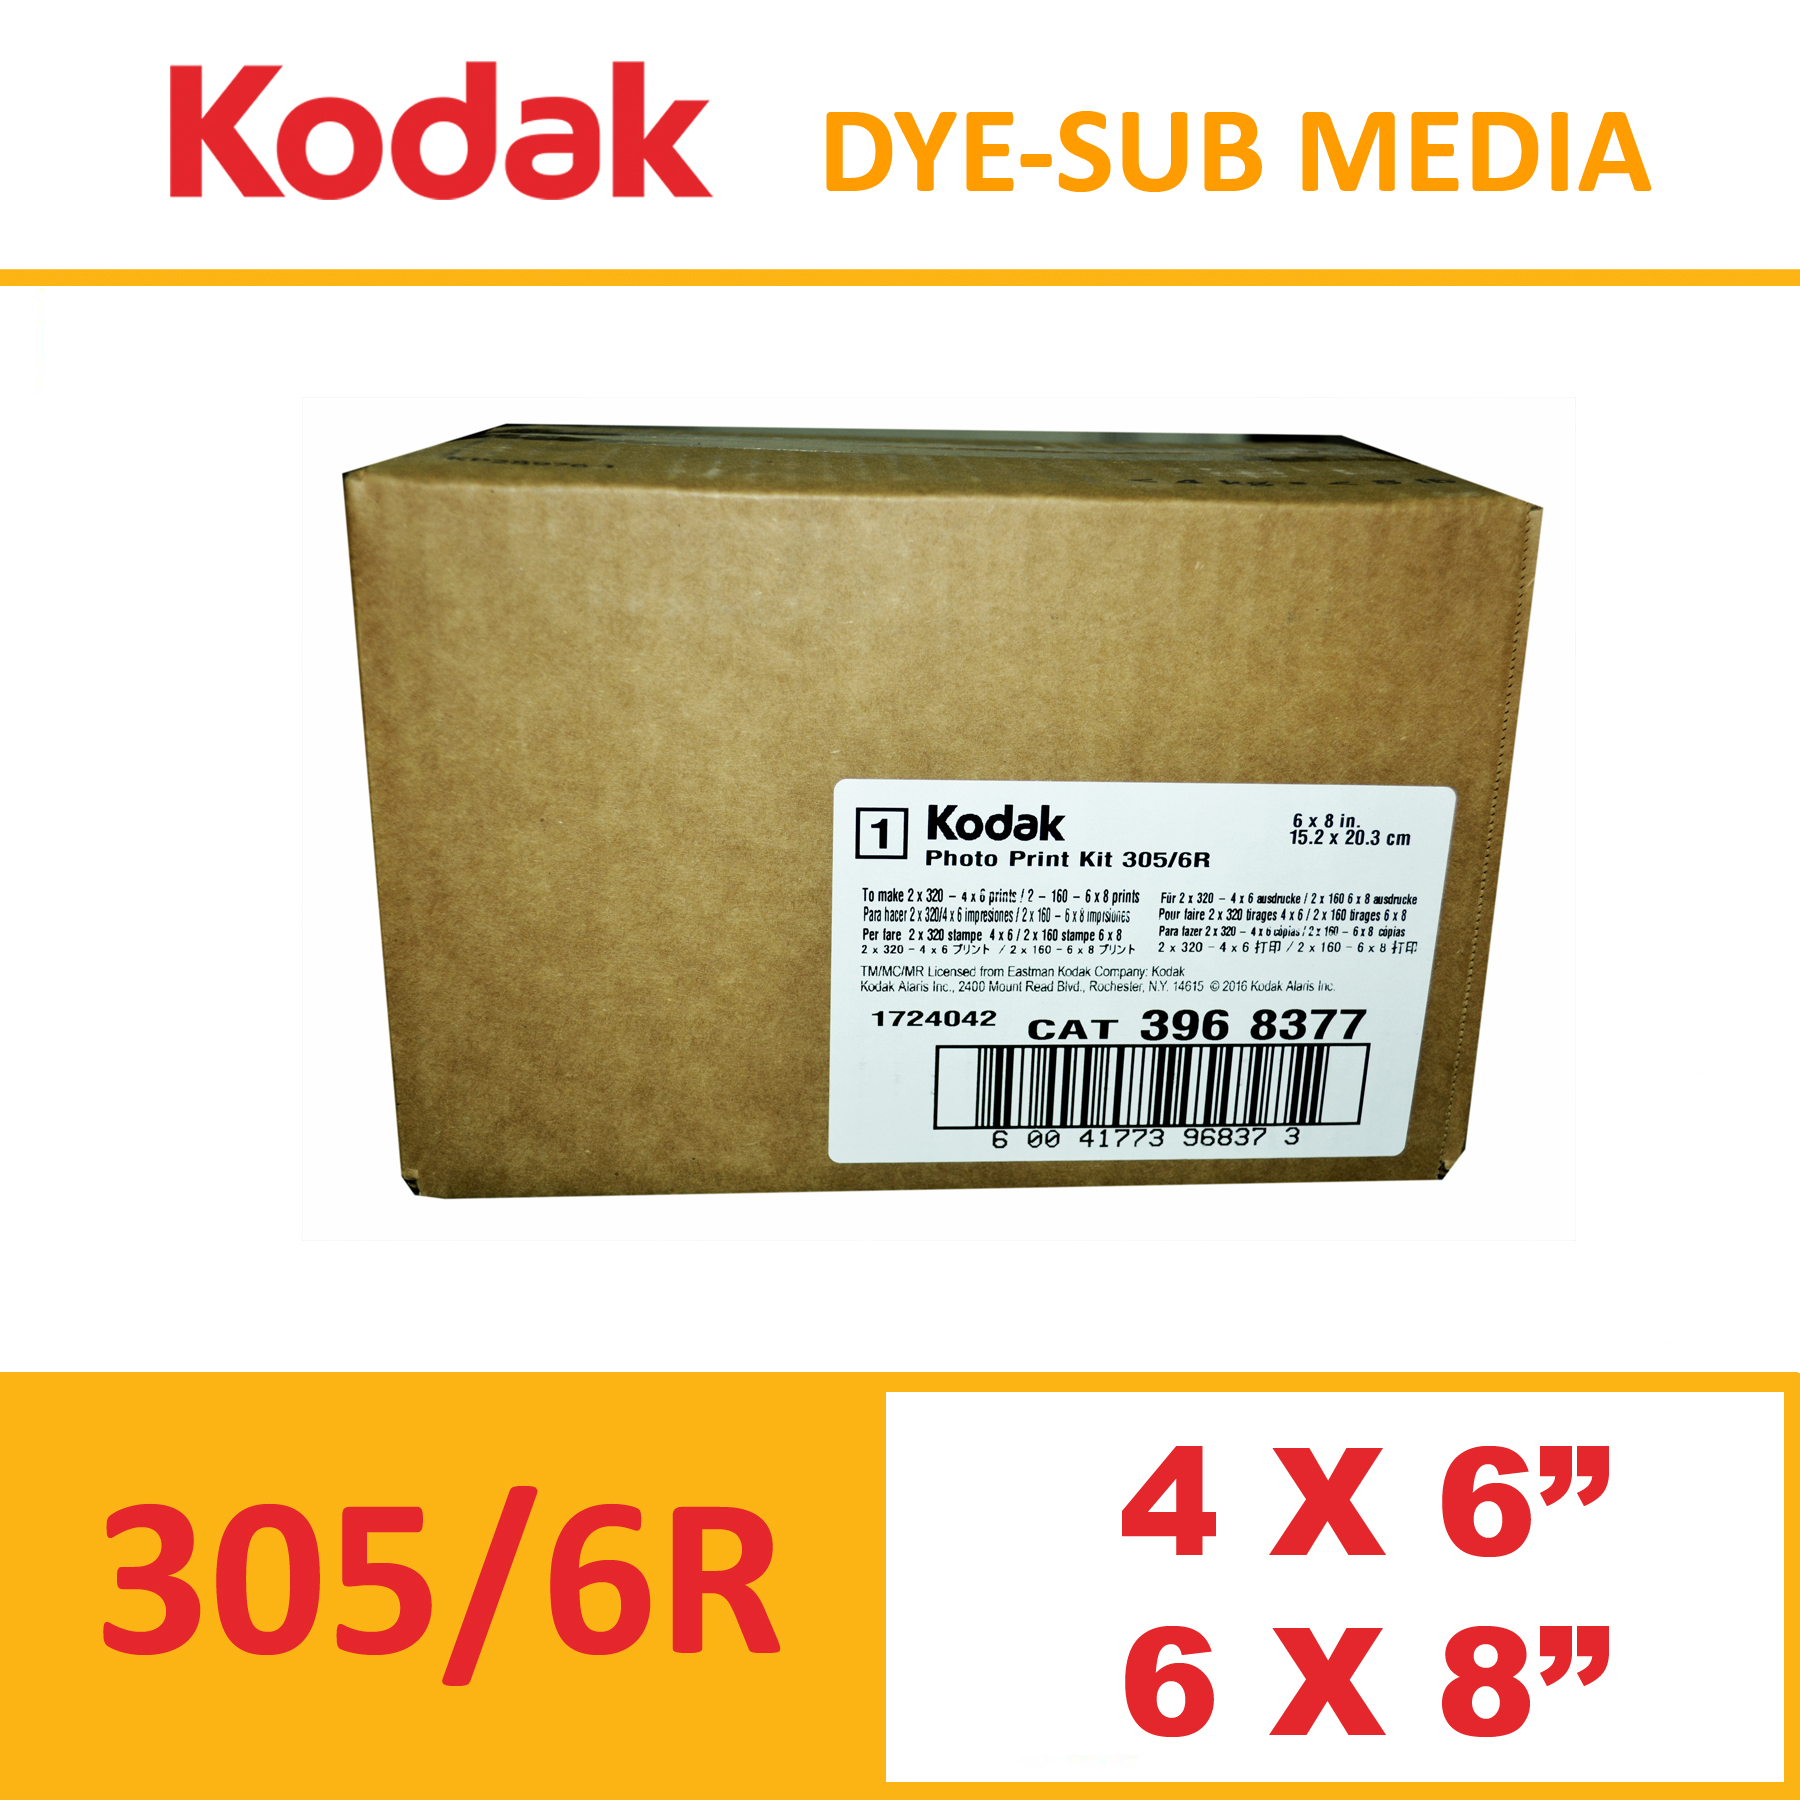 Kodak 305 Dye-Sub Photo Printer Media Kit